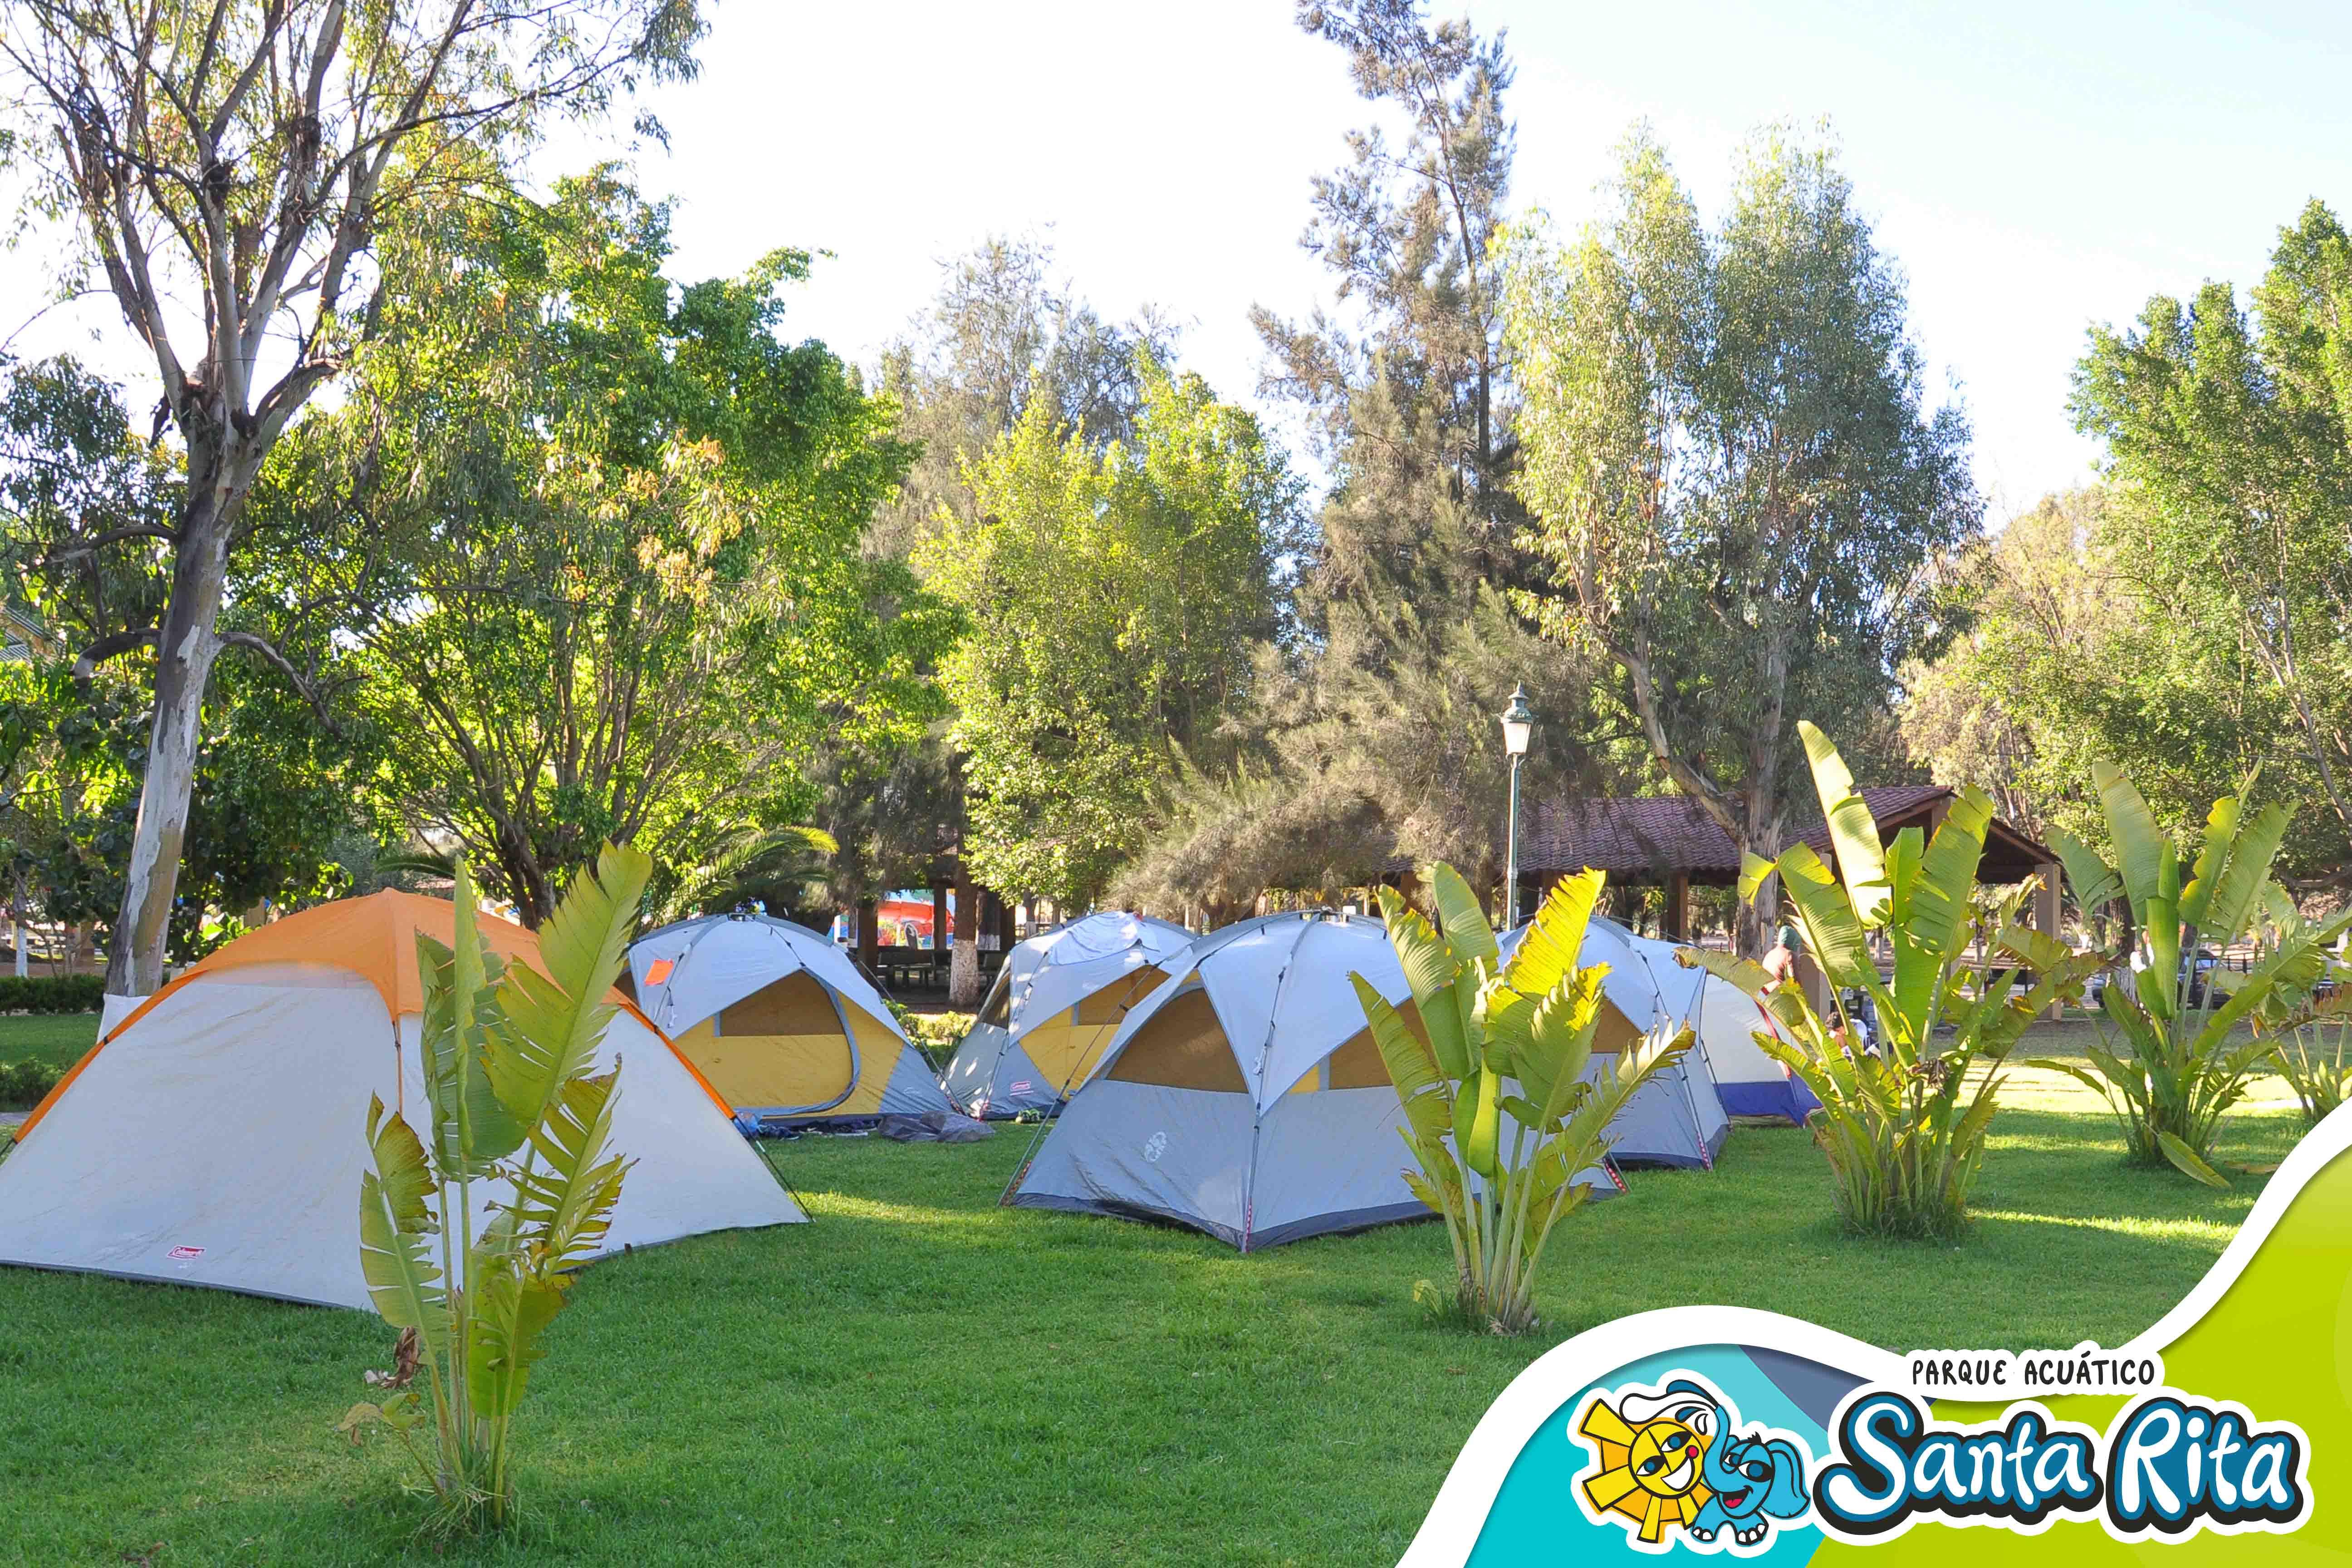 Campingparqueacuaticosantarita2